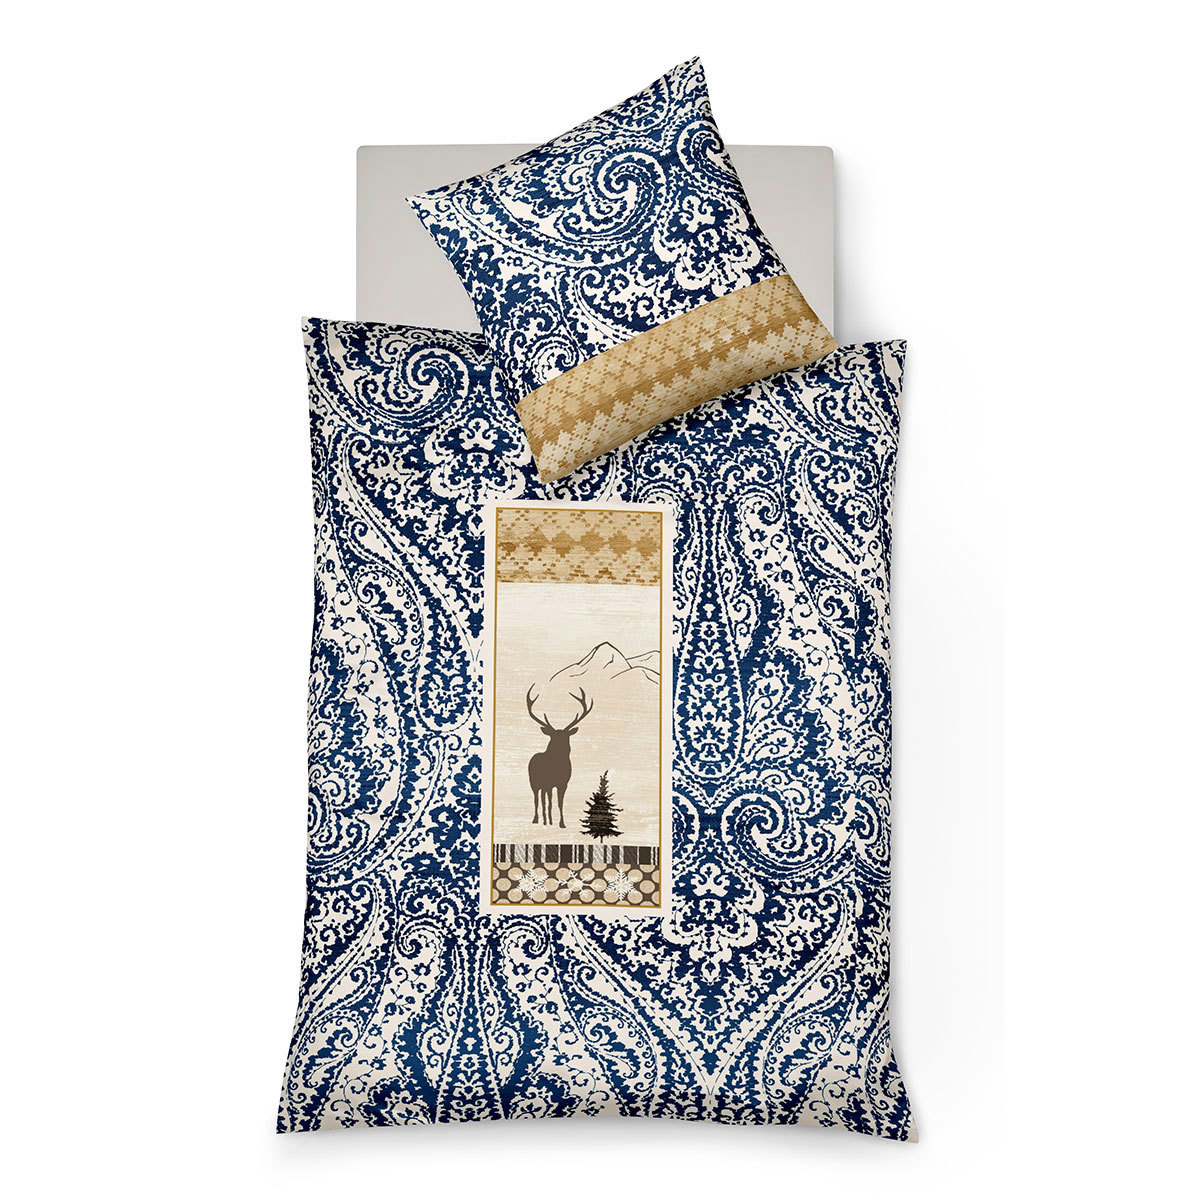 fleuresse feinbiber bettw sche hirsch blau g nstig online kaufen bei bettwaren shop. Black Bedroom Furniture Sets. Home Design Ideas